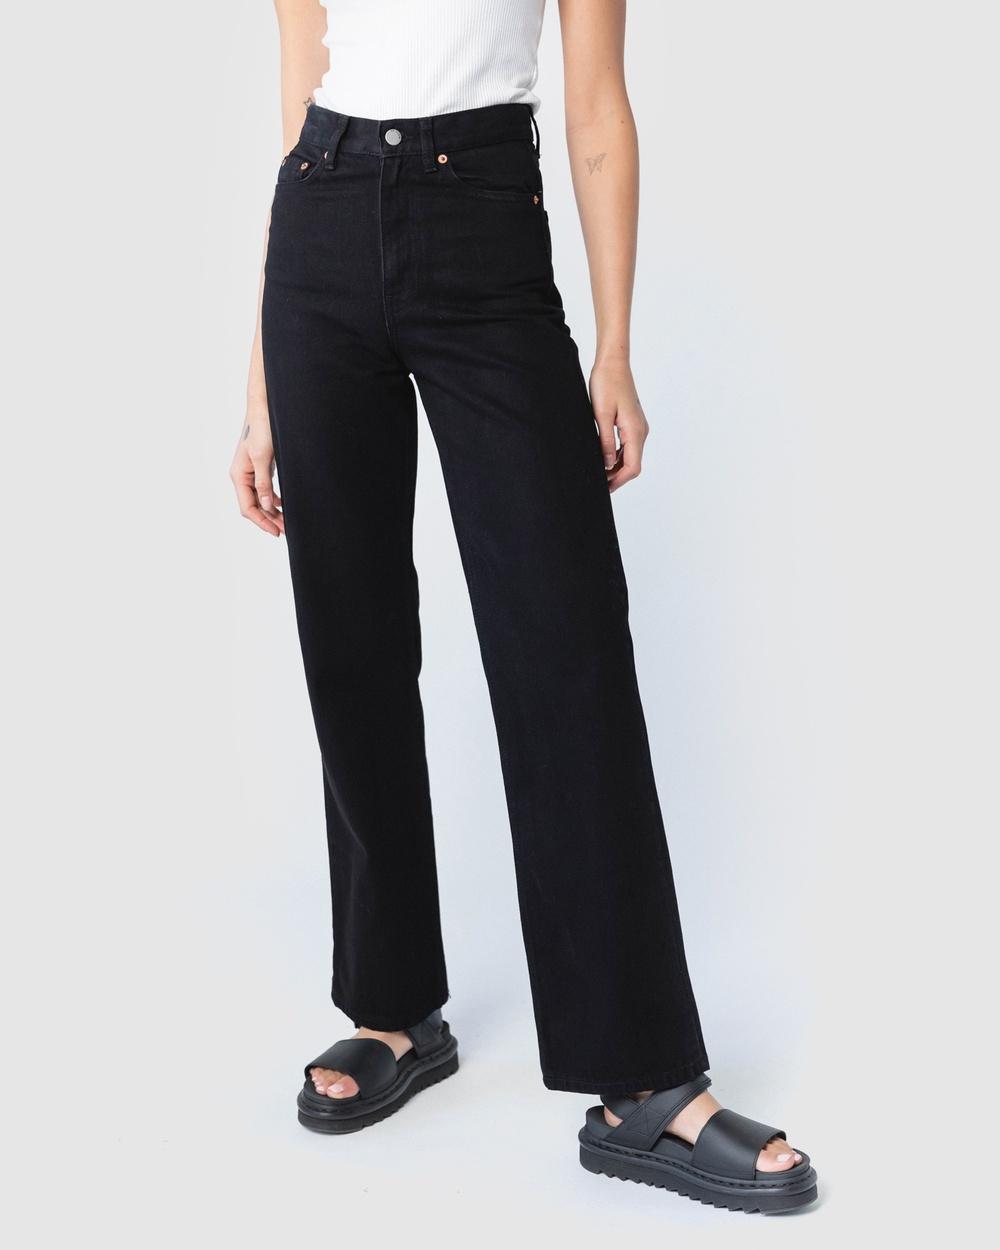 Dr Denim Echo Jeans High-Waisted Black Australia